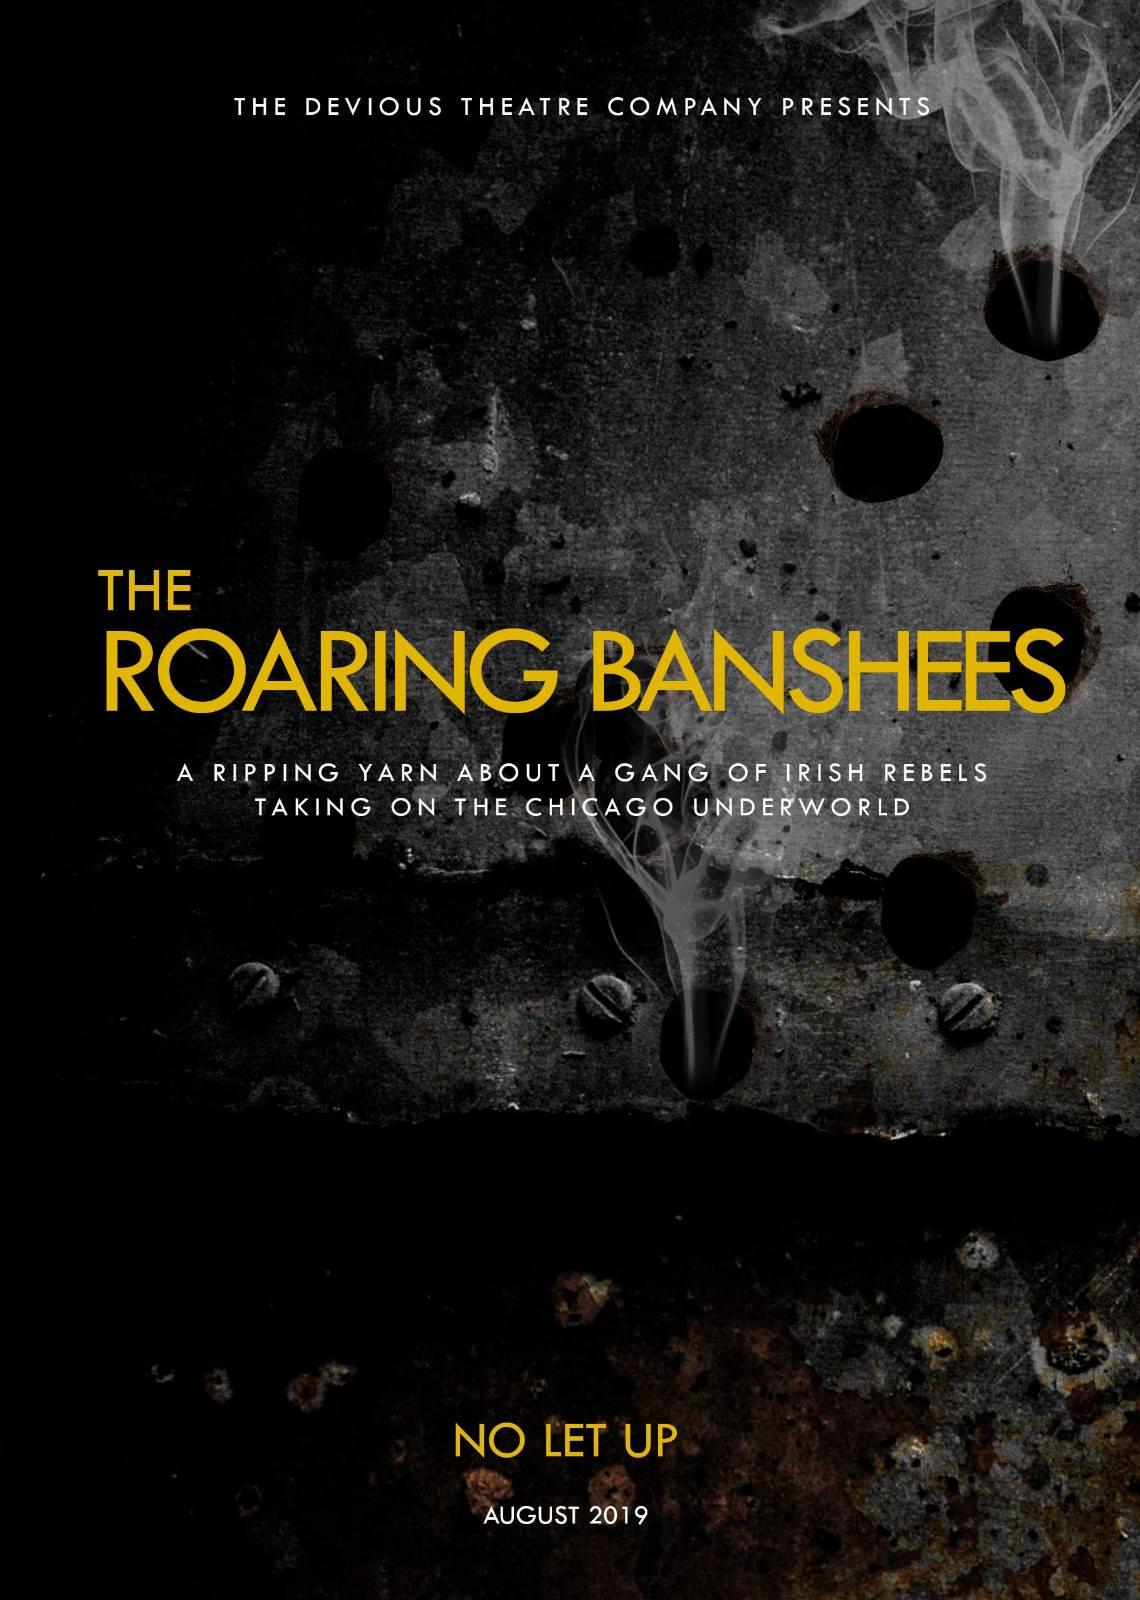 The Roaring Banshees teaser image